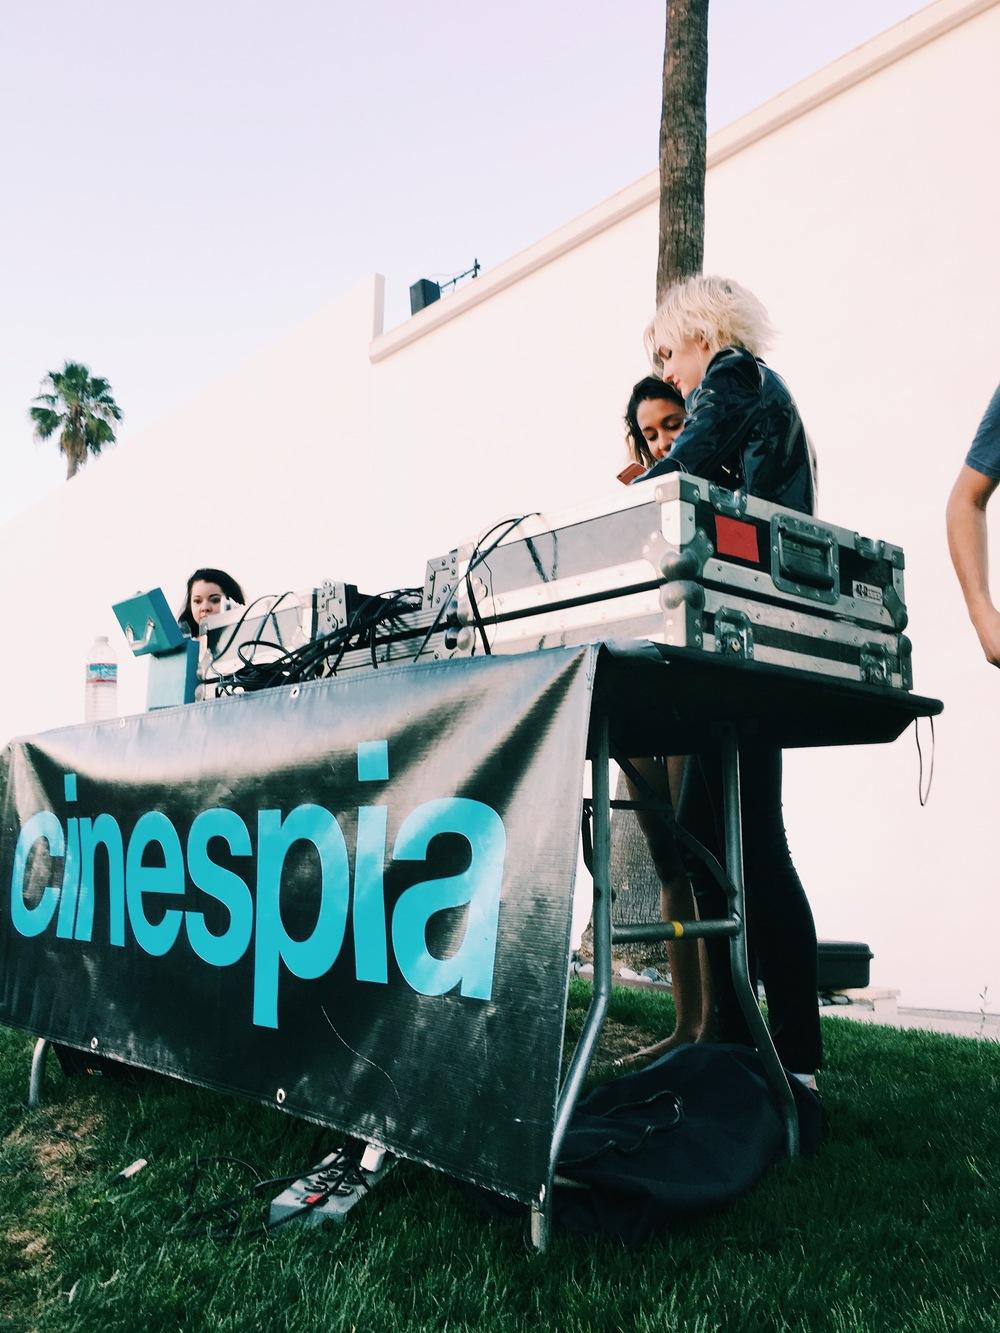 DJ set thanks to cinespia